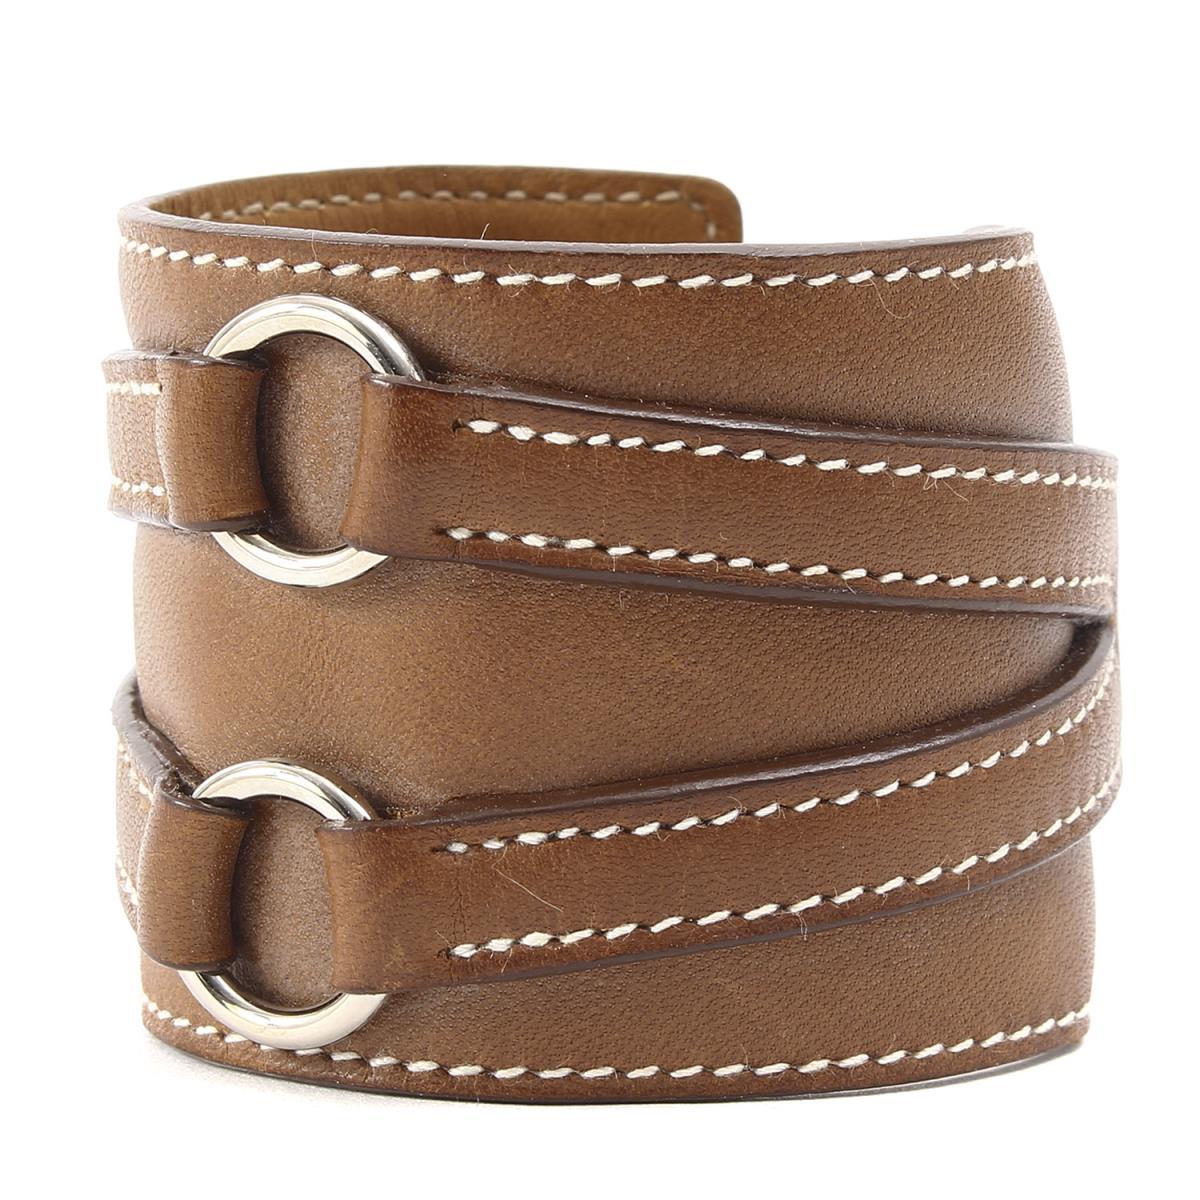 04fad3398f31 BEEGLE by Boo-Bee  HERMES (Hermes) ring belt leather bracelet brown ...